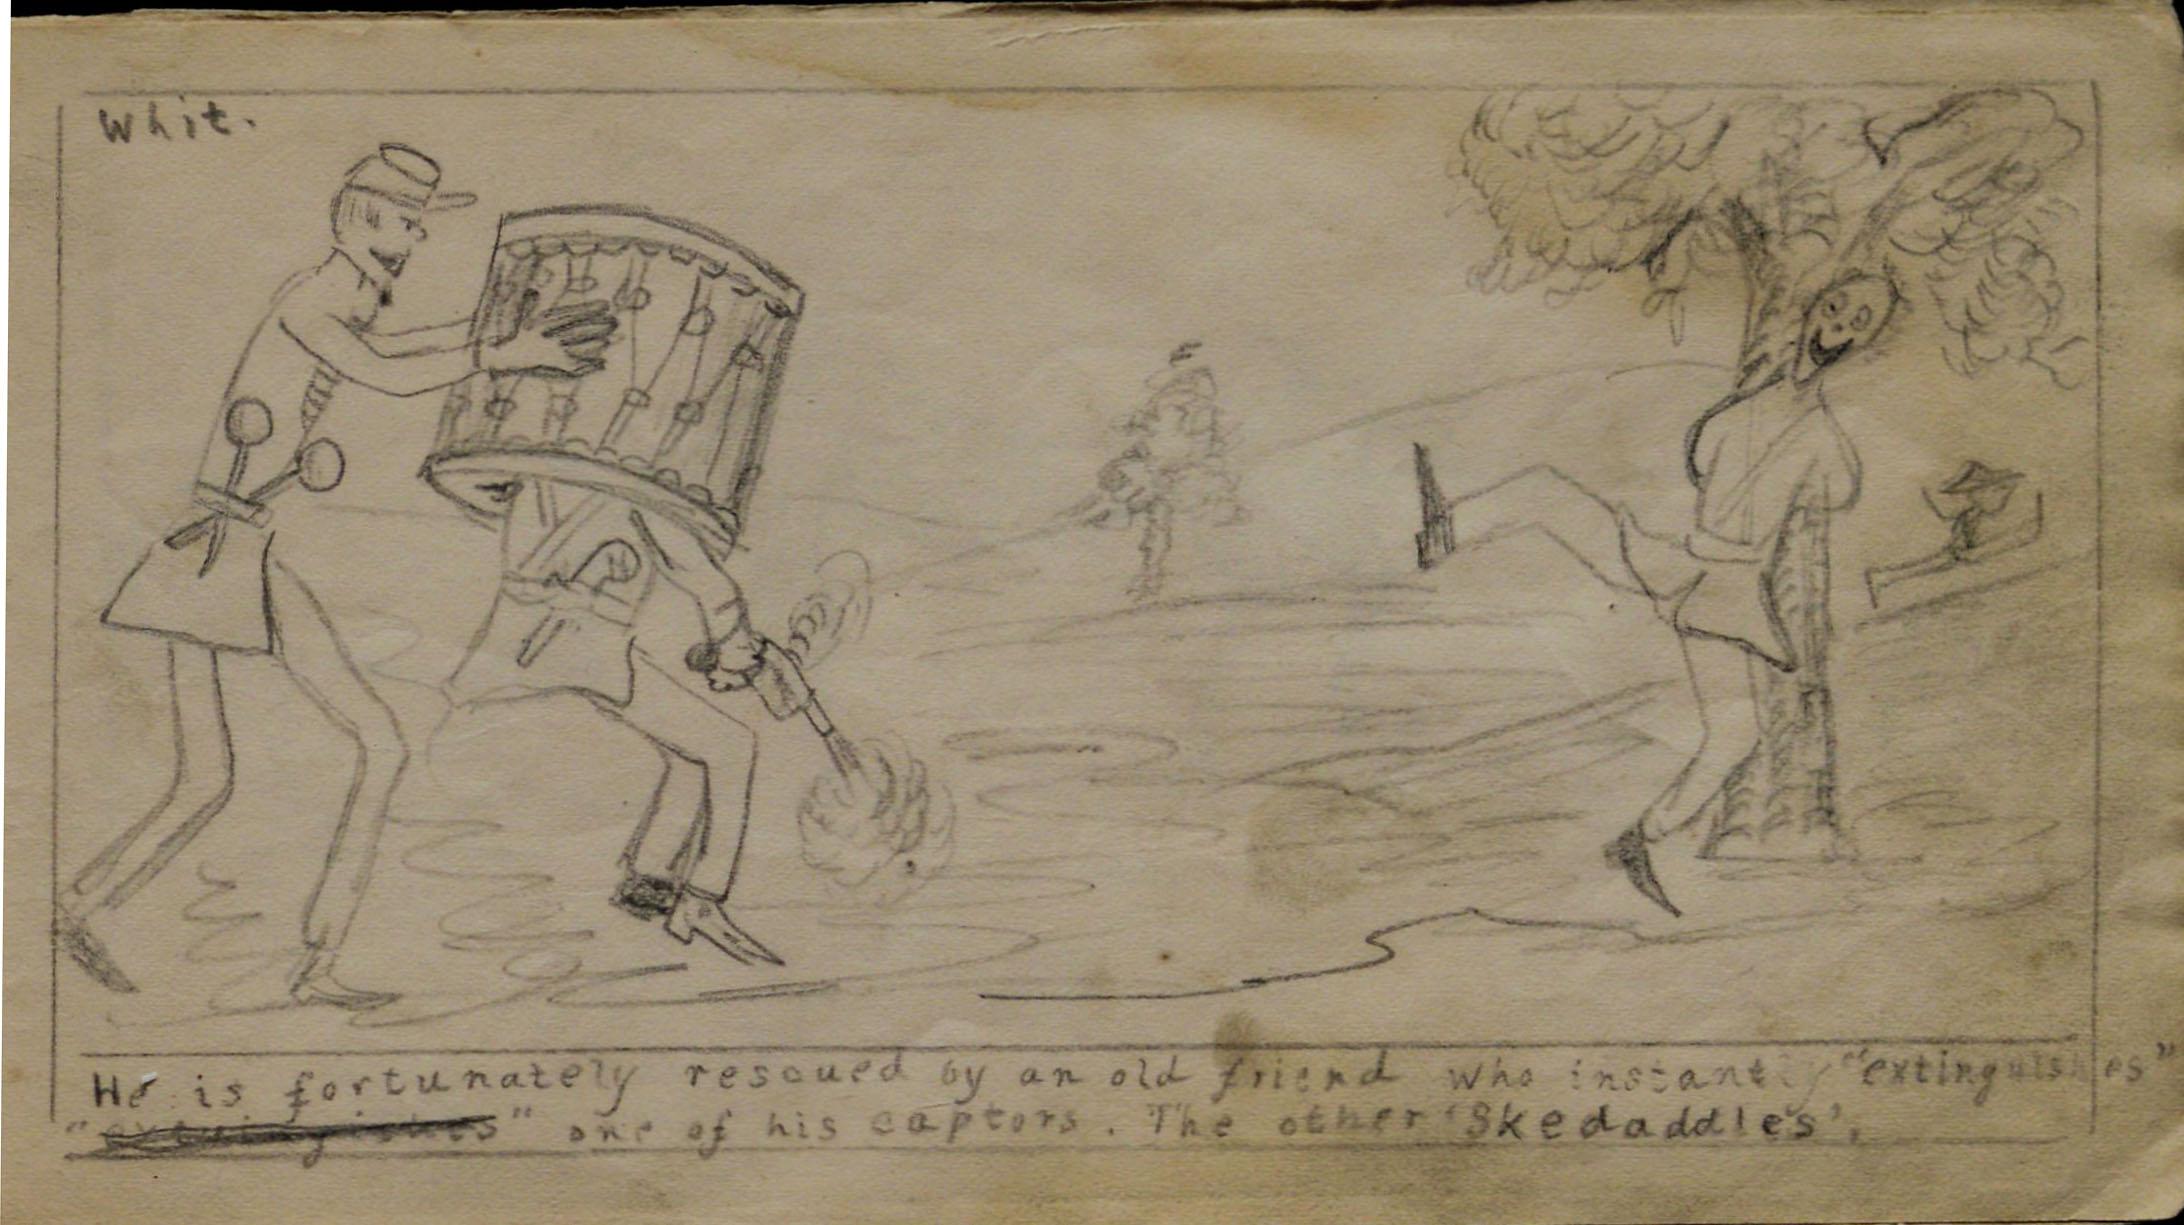 a civil war soldier s sketchbook gilder lehrman institute of